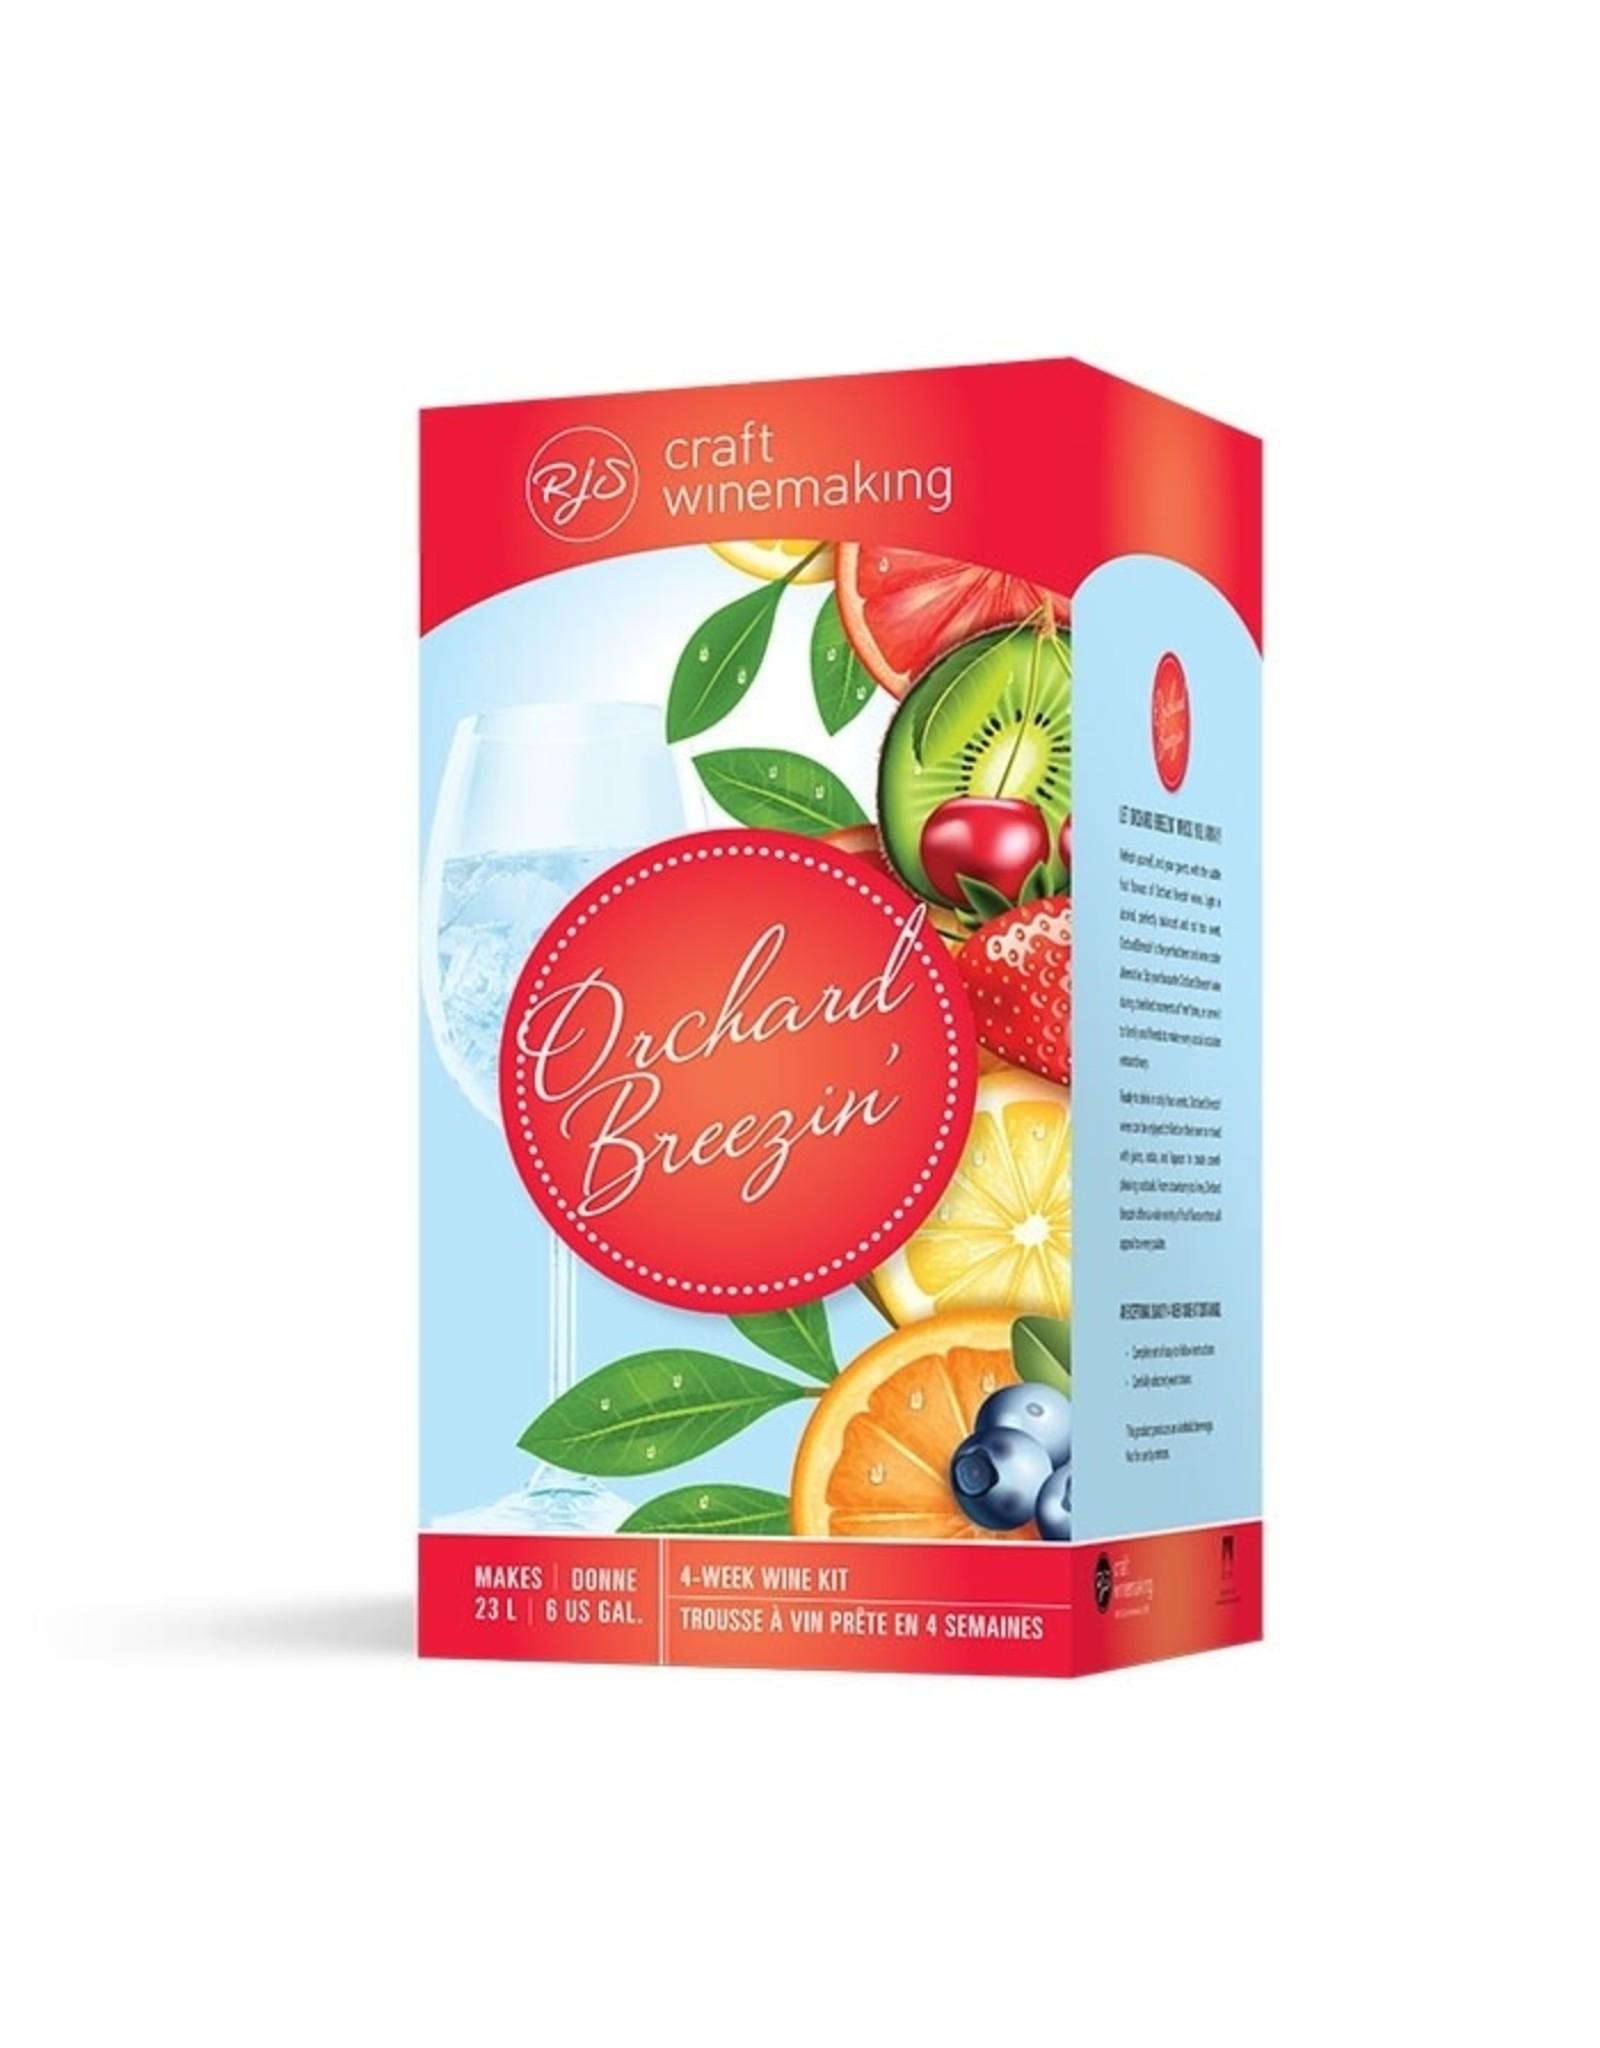 RJS Orchard Breezin' Peach Perfection